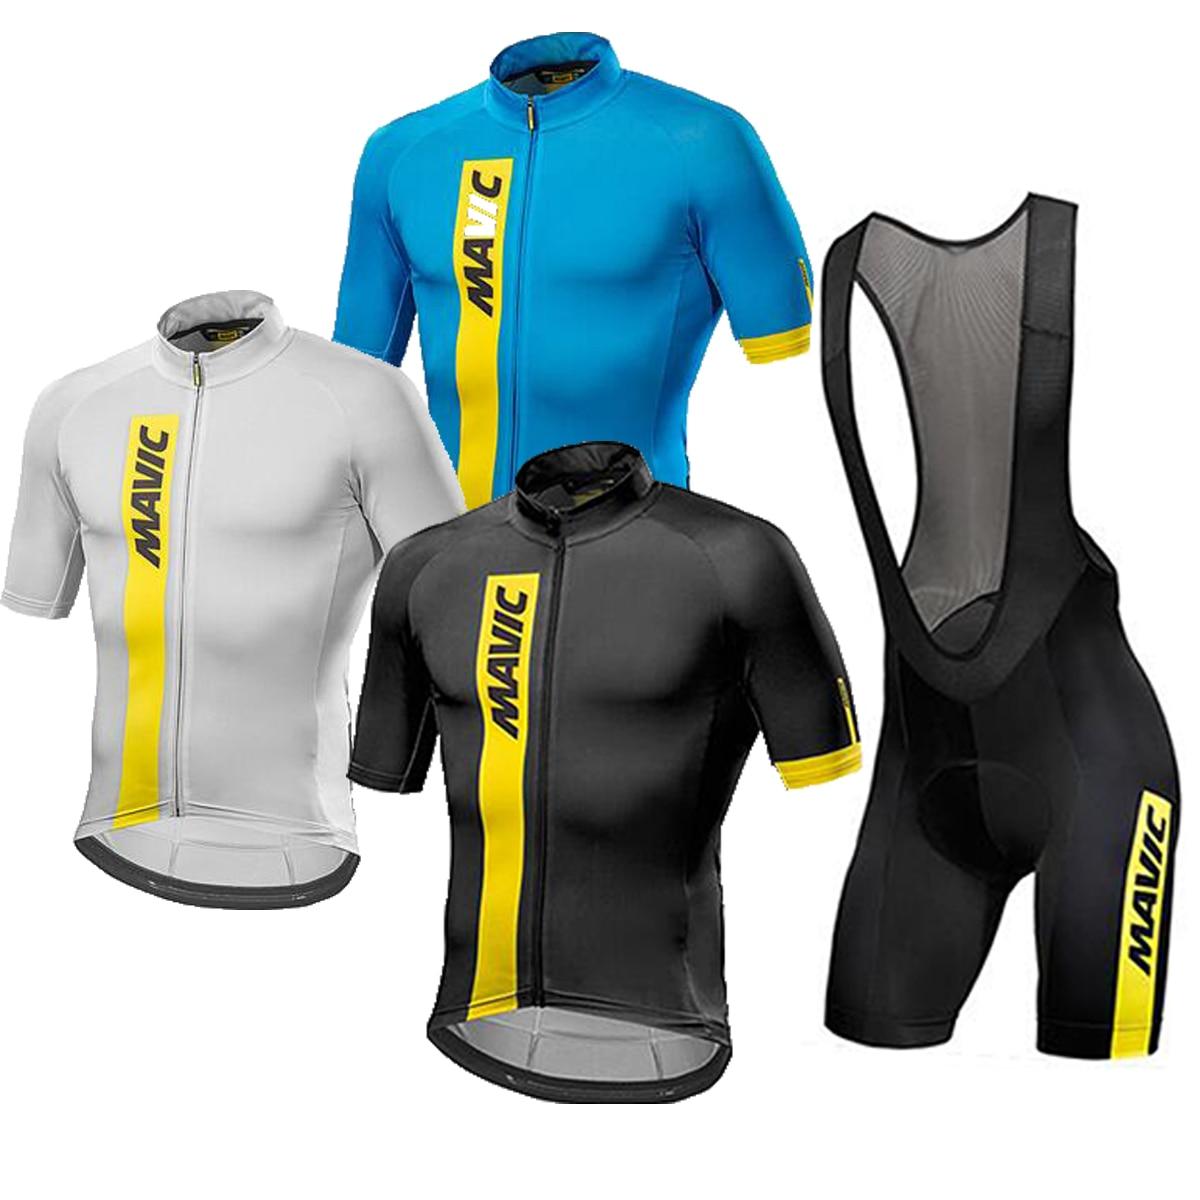 2017 Team Mavic Summer Short Sleeve Cycling Jersey Clothing Bike Clothes Set Ropa Ciclismo martin lemon mens top sleeve cycling jersey bike shirt cycling clothing ilpaladin